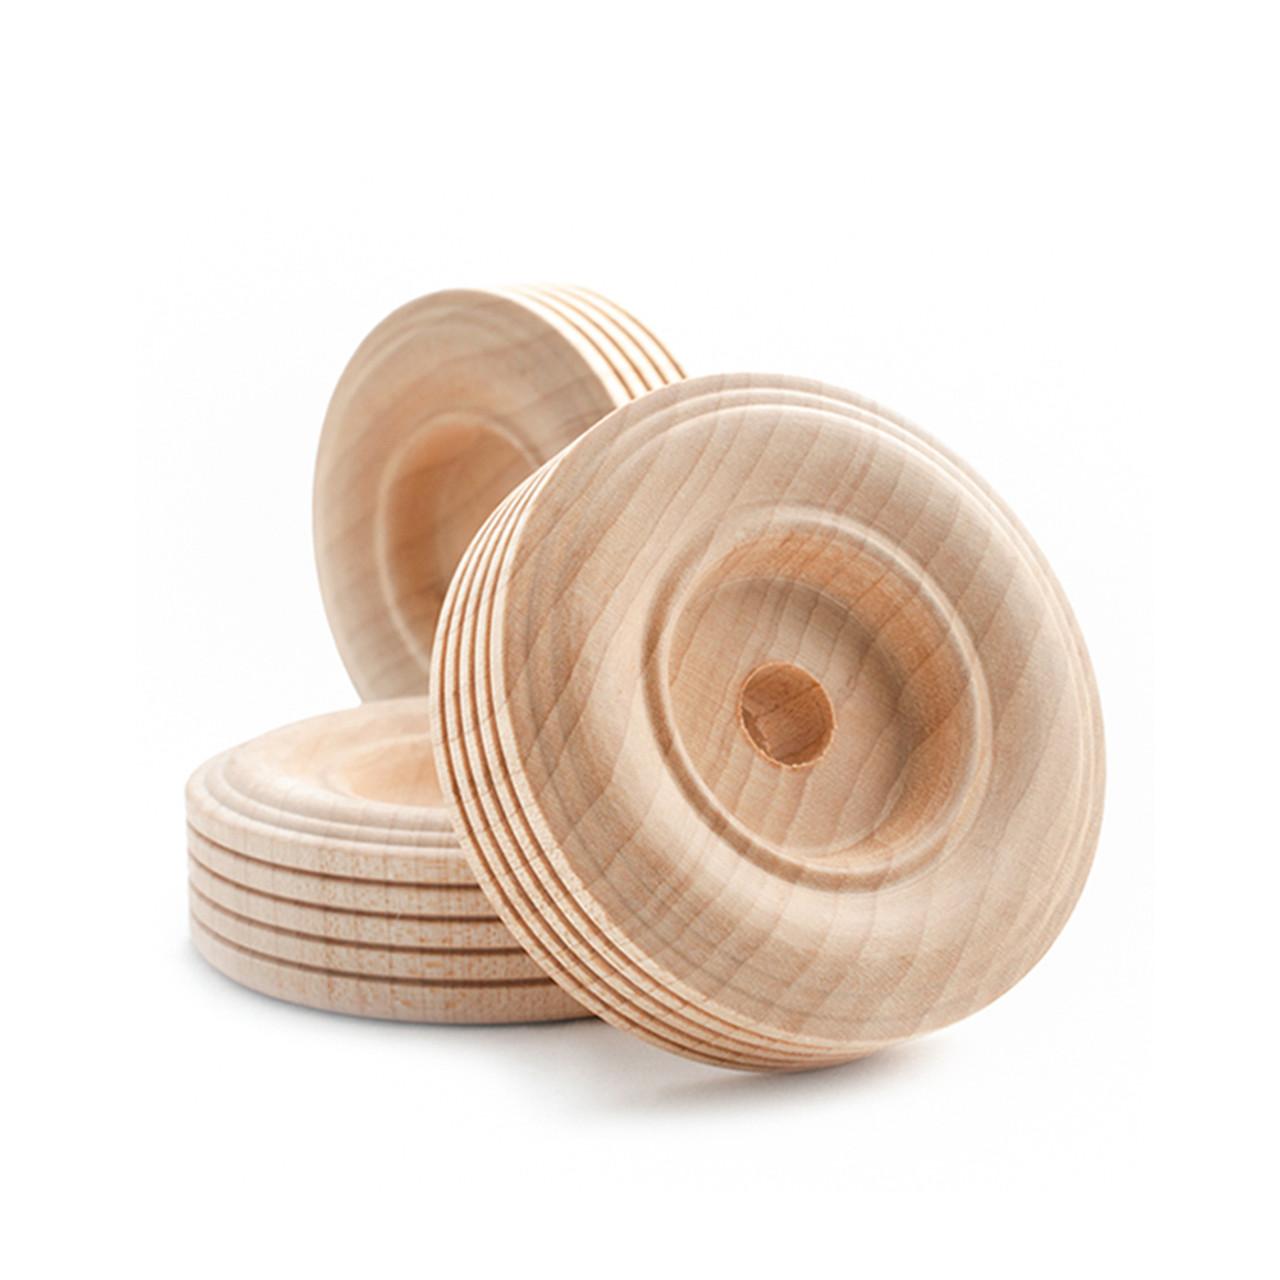 2 1/2 Inch Treaded Toy Wheels